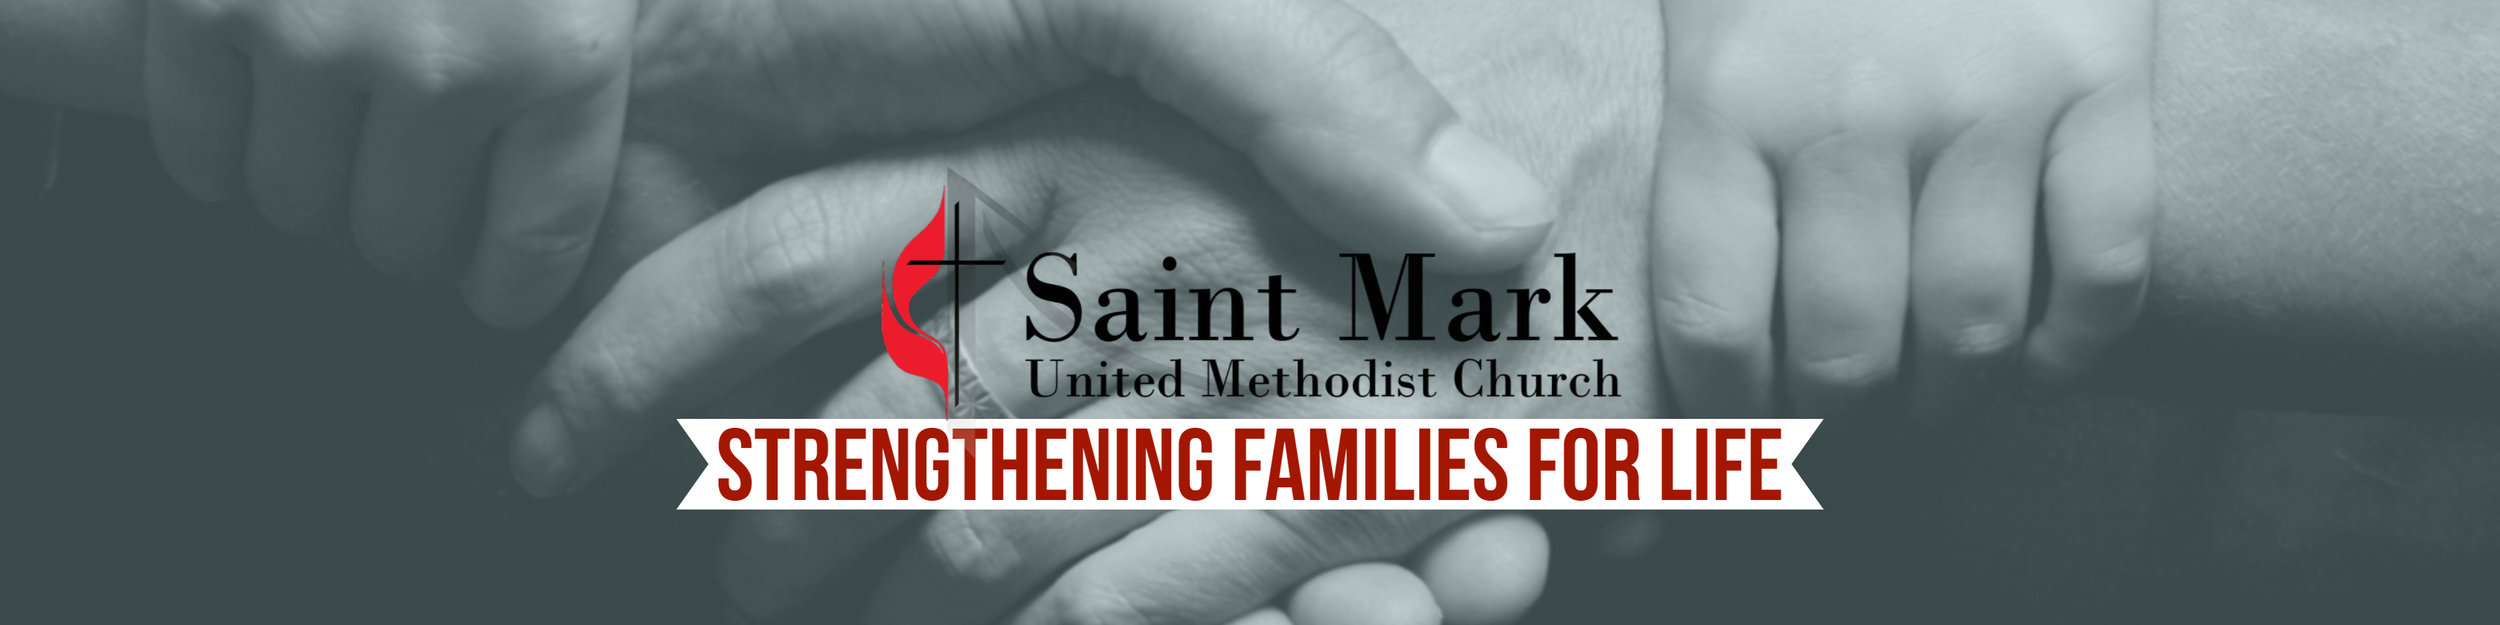 Saint Mark UMC Northport Small Groups & Studies — Saint Mark Northport